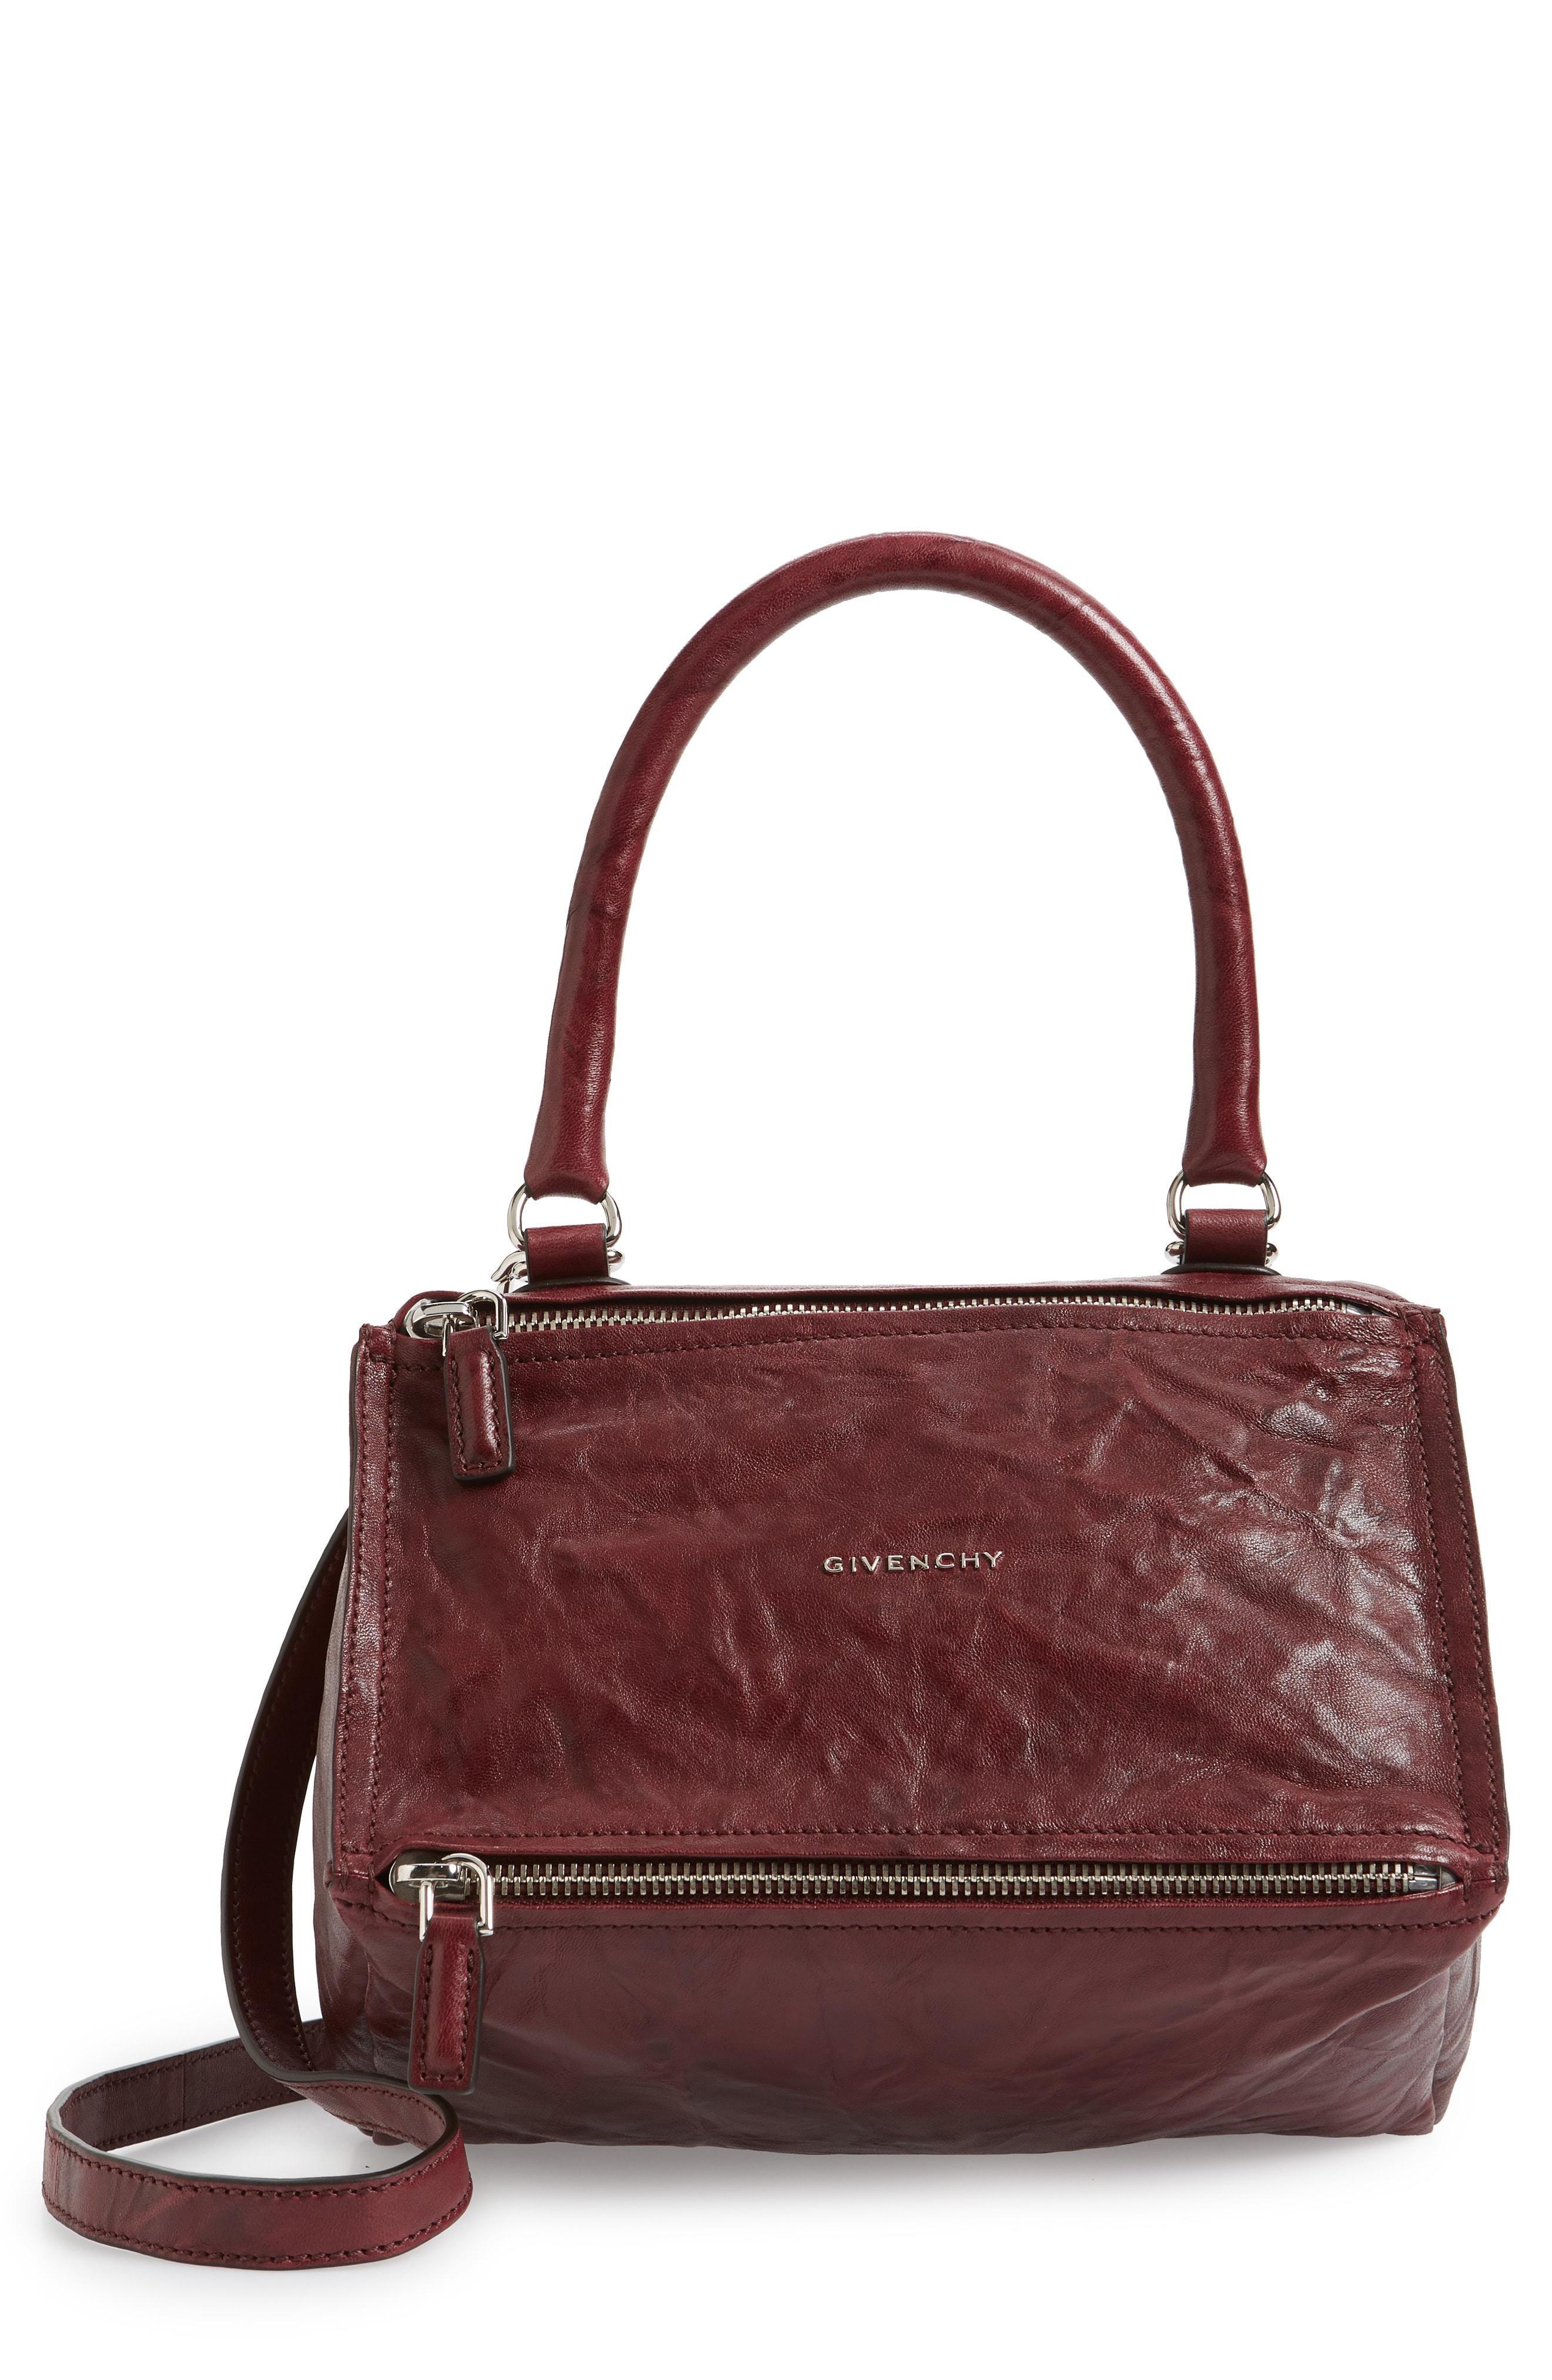 Givenchy - Brown  small Pepe Pandora  Leather Crossbody Bag - Burgundy -  Lyst. View fullscreen 32fdfb619b8bd